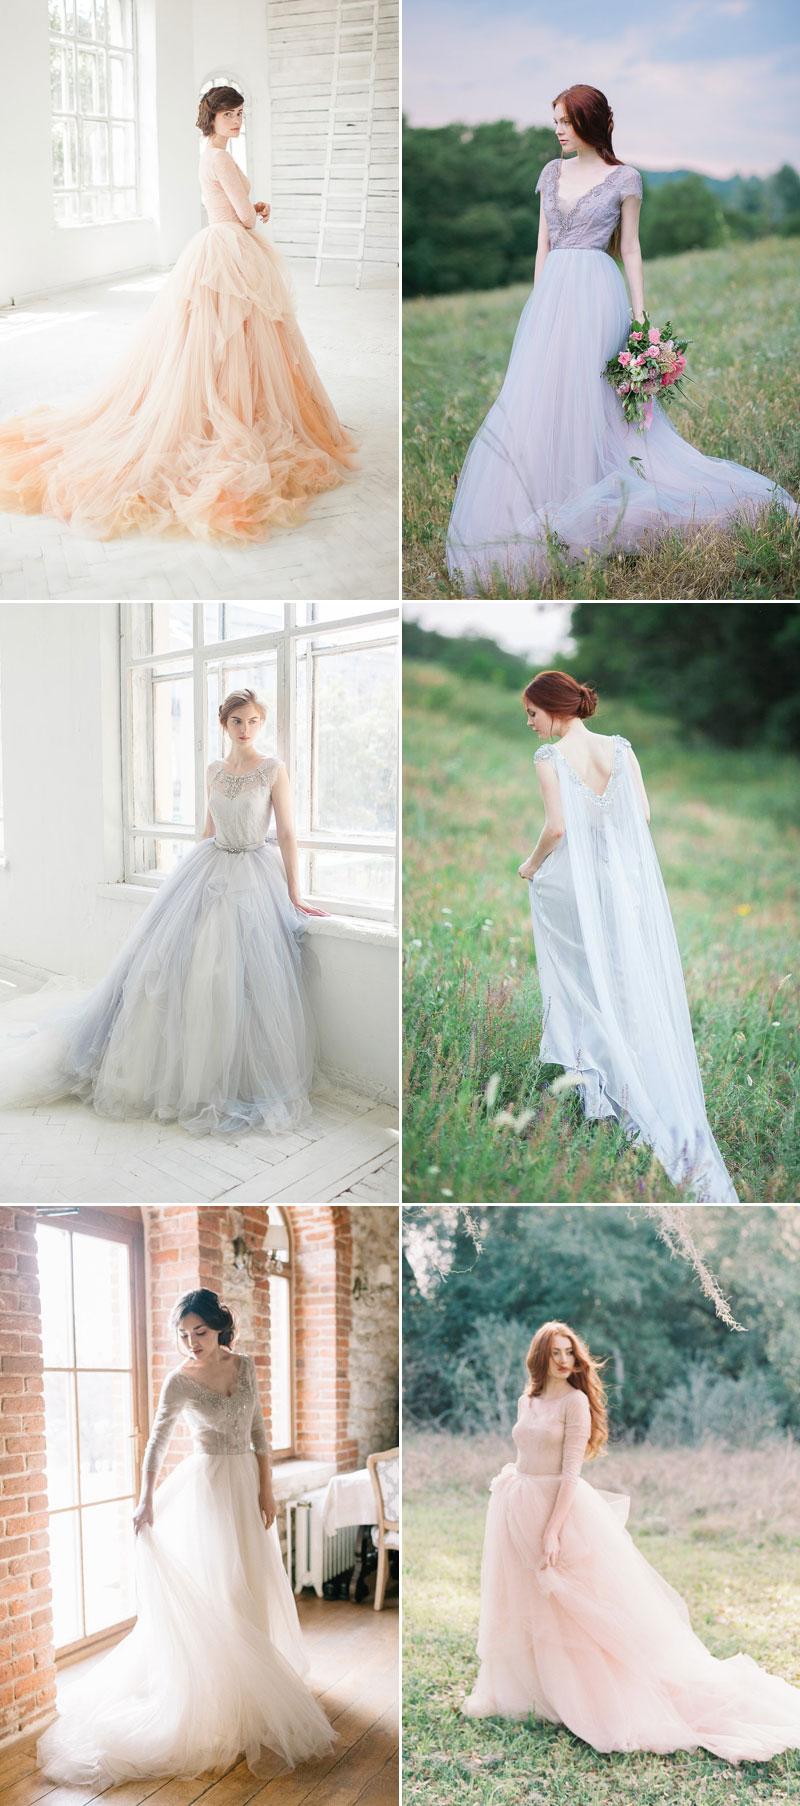 Fairy Like Wedding Dress Xb44 Advancedmagebysara